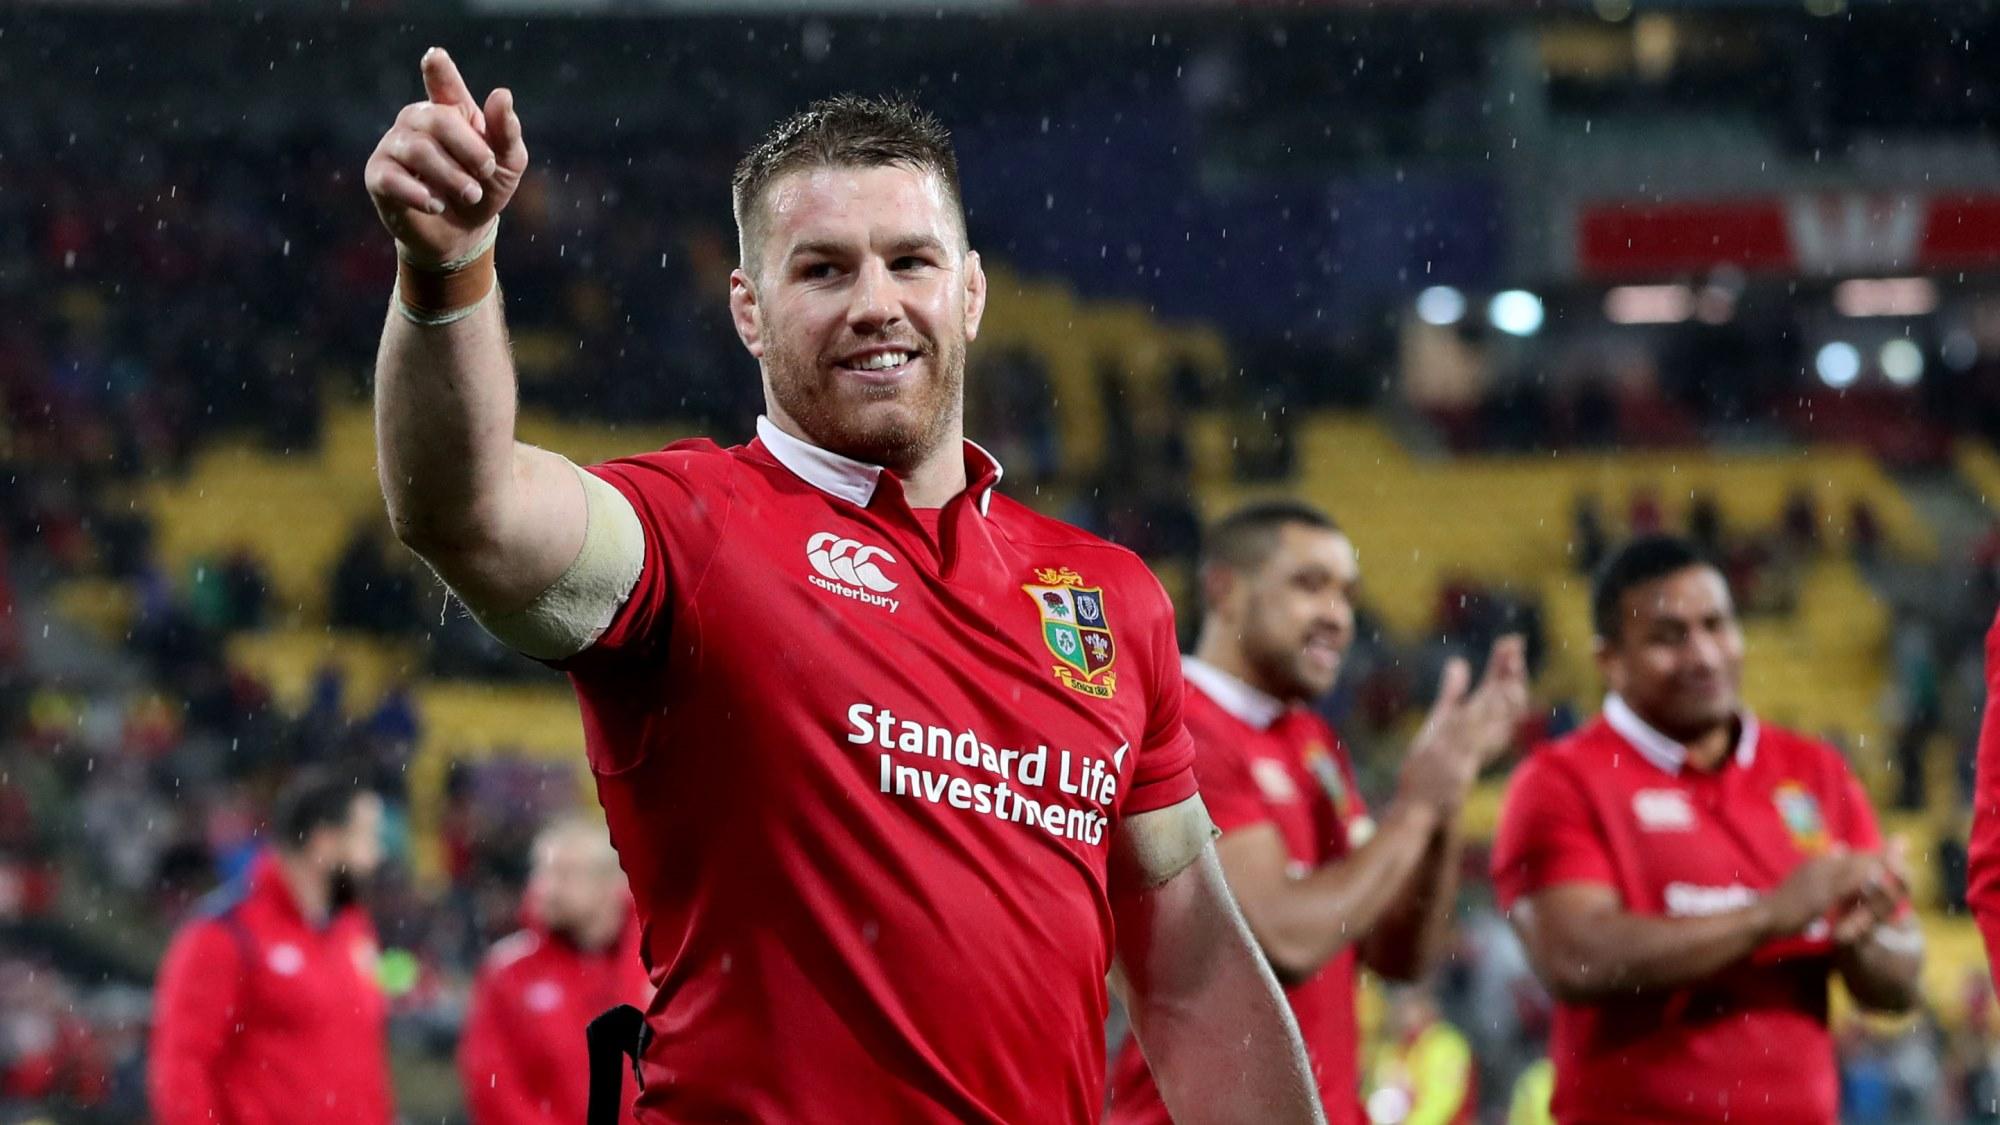 2017 Lions player retrospective: Sean O'Brien